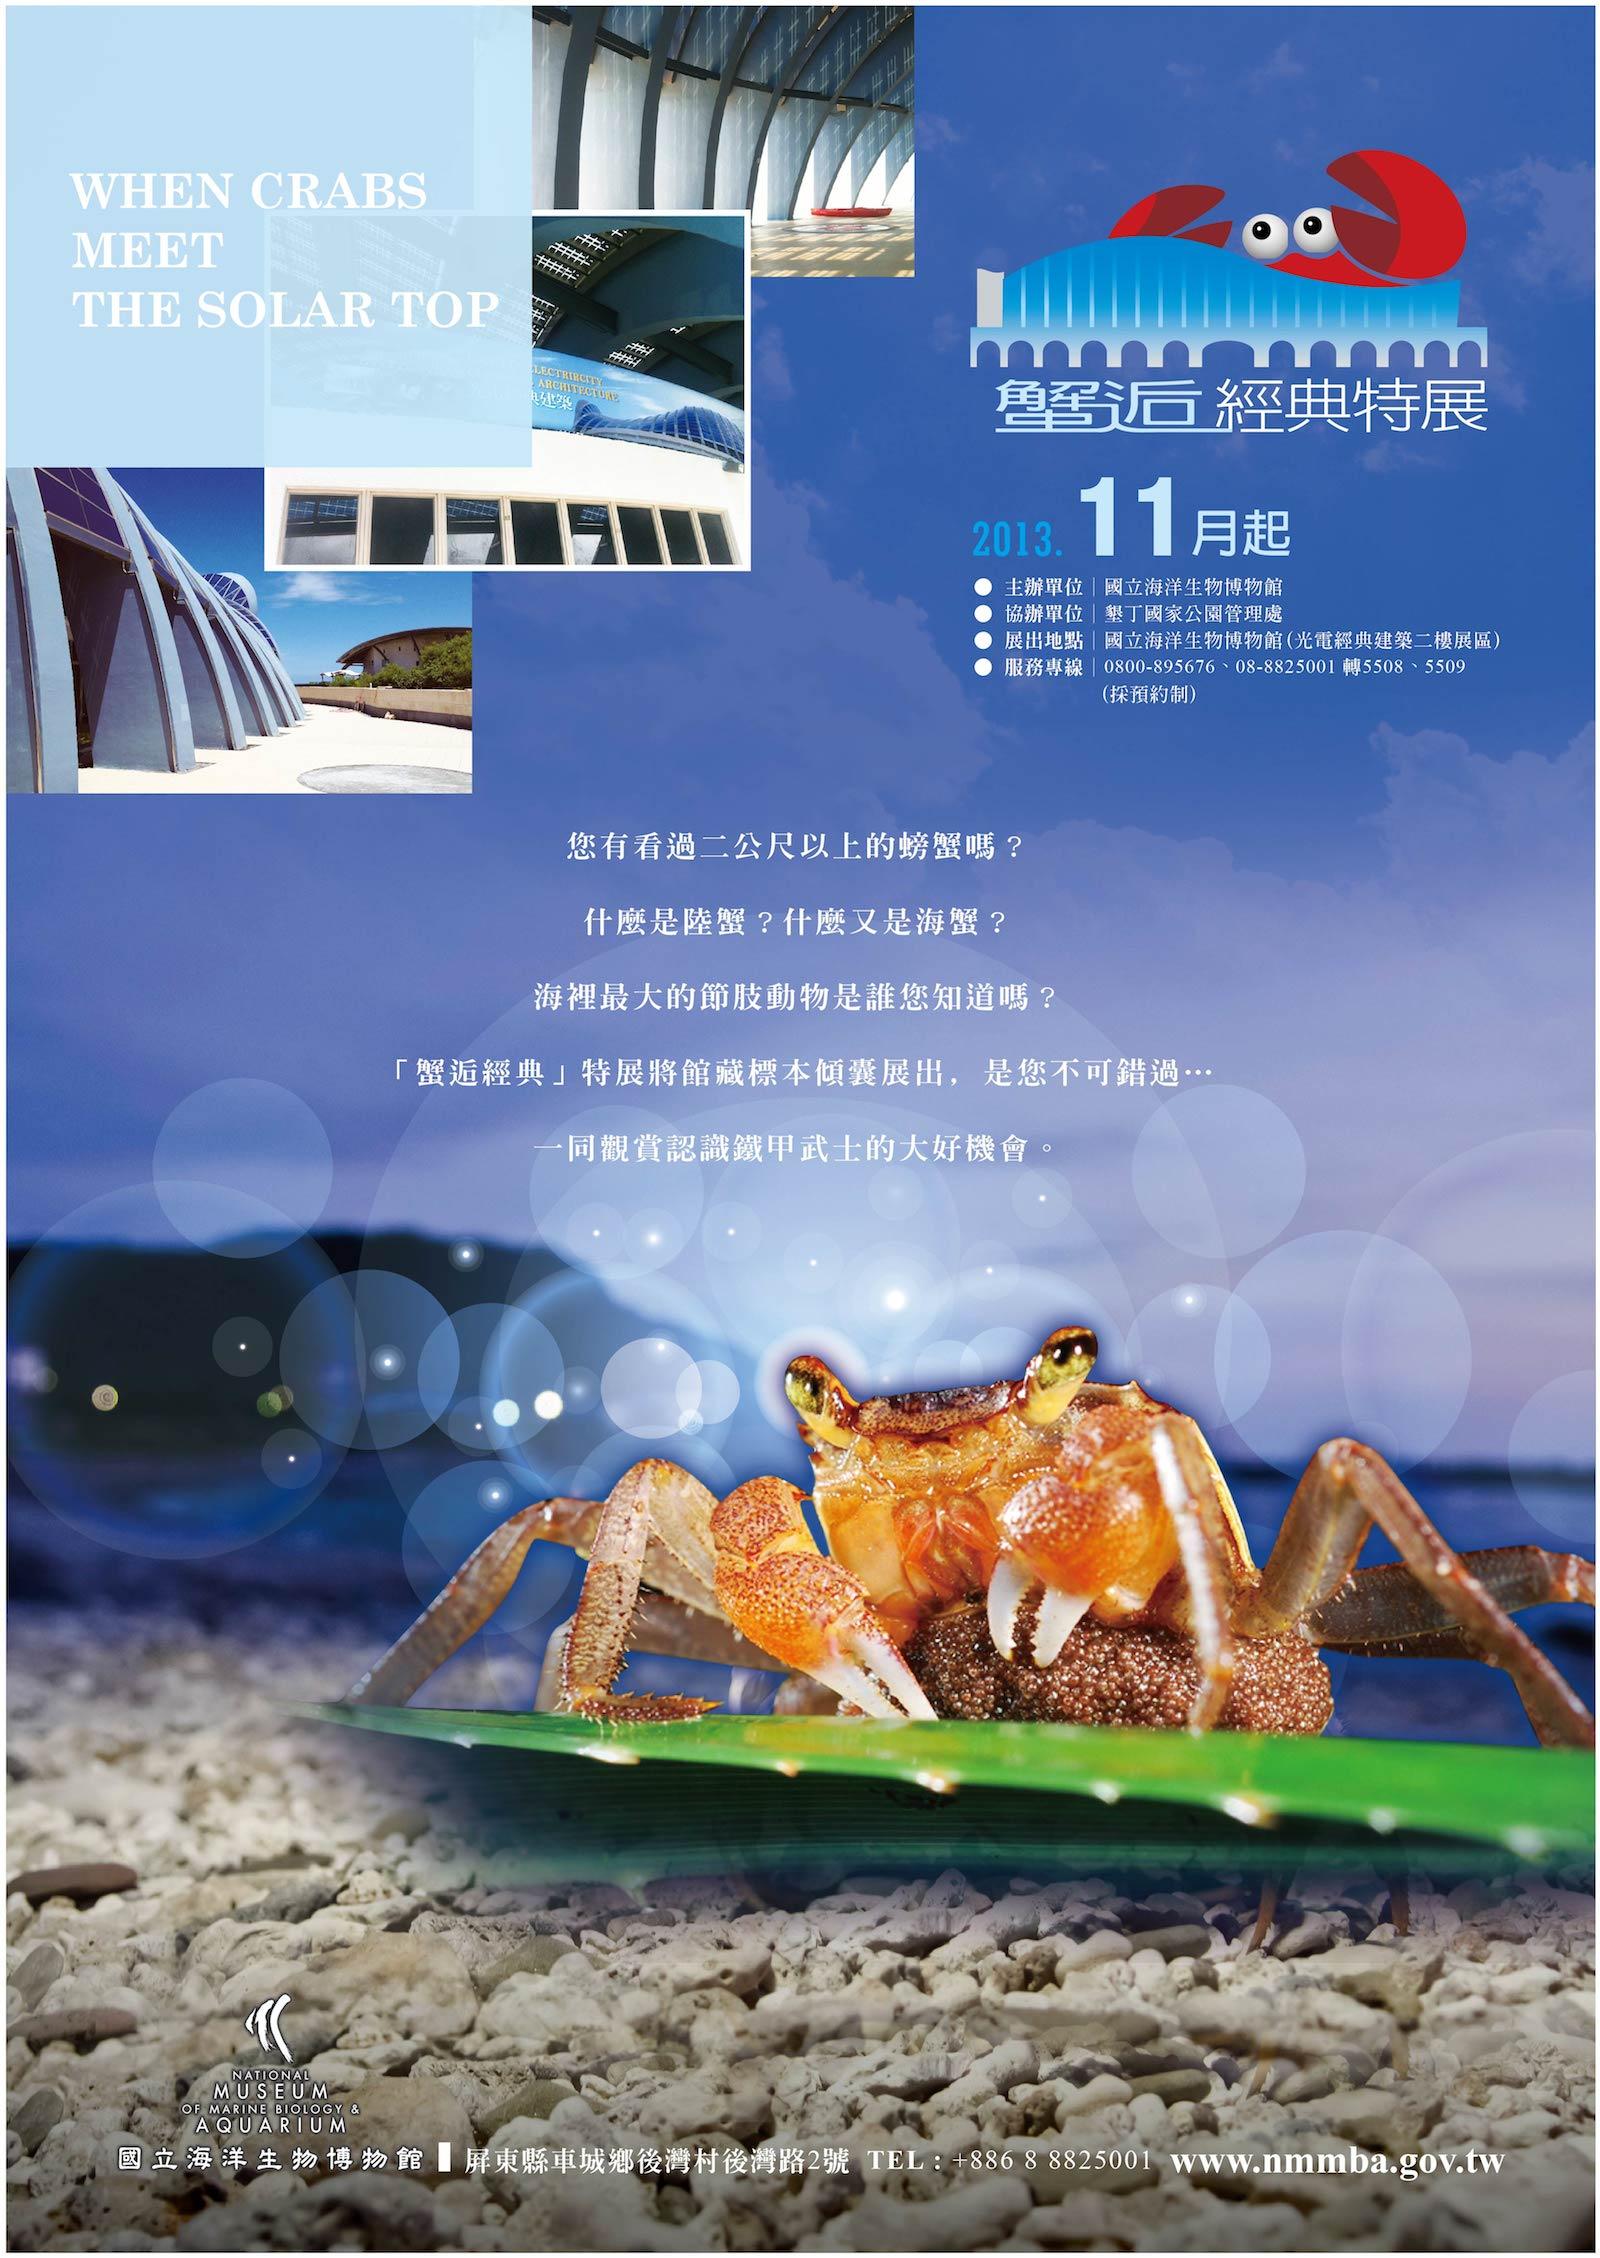 When crabs meet the solar power